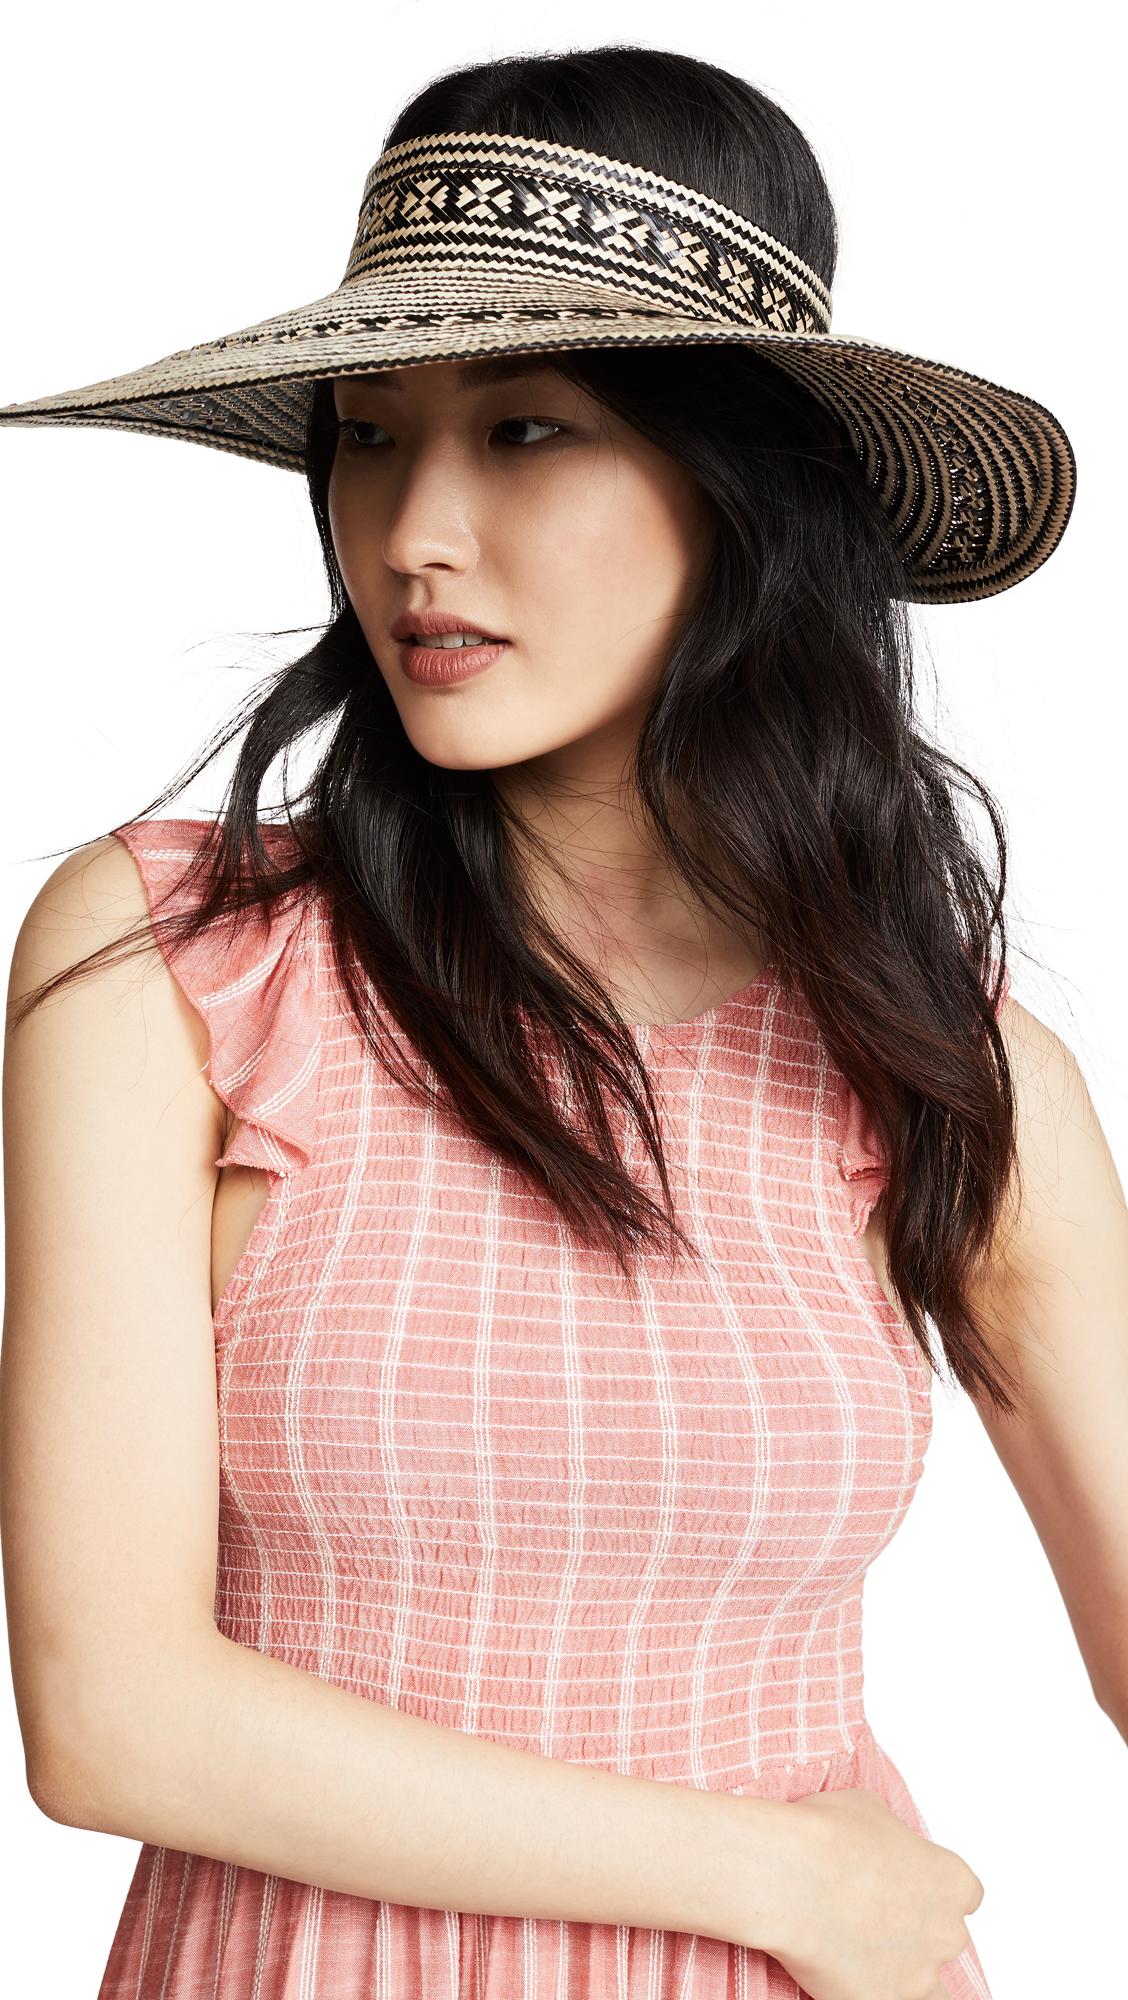 YOSUZI Kiera Hat In Black/Multi